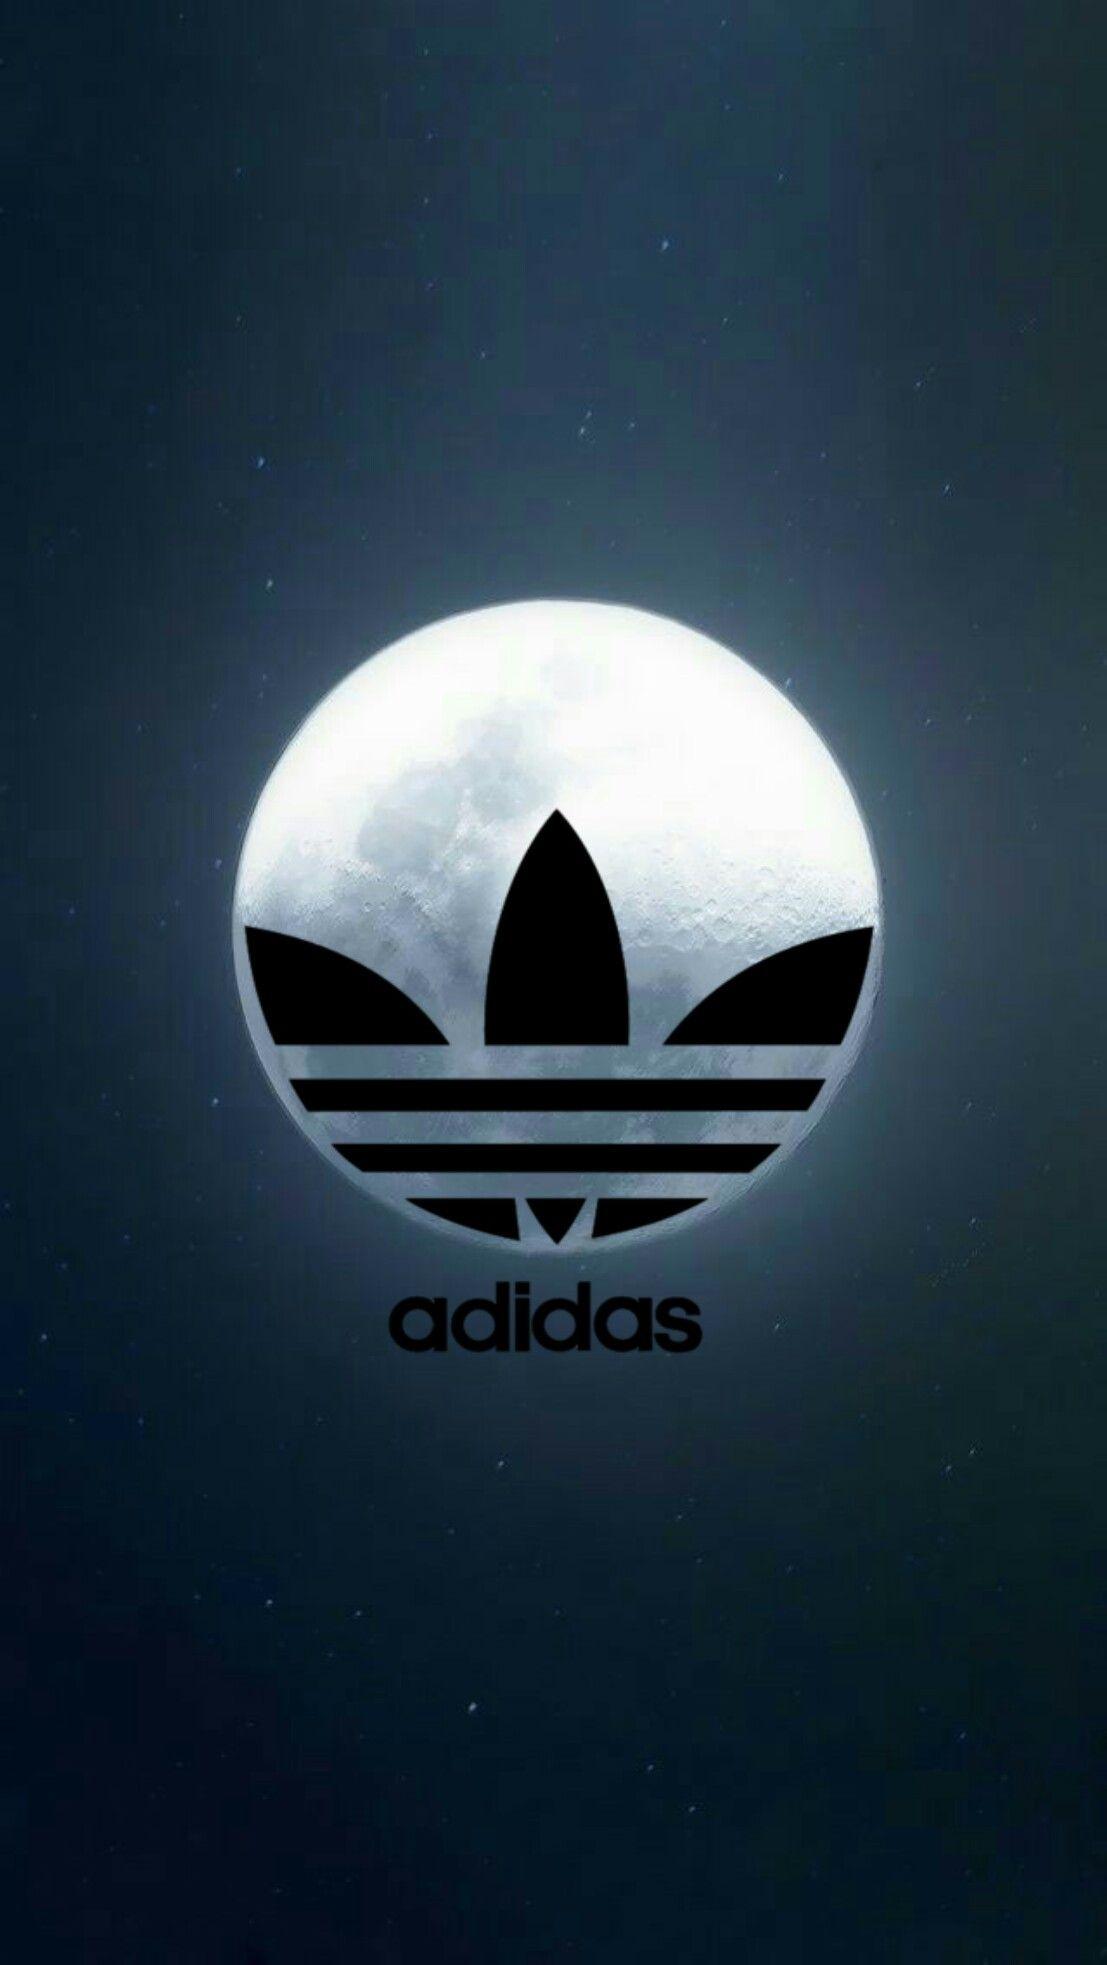 Adidas Black Wallpaper Android Iphone アディダス壁紙 Iphone 用壁紙 ポスター